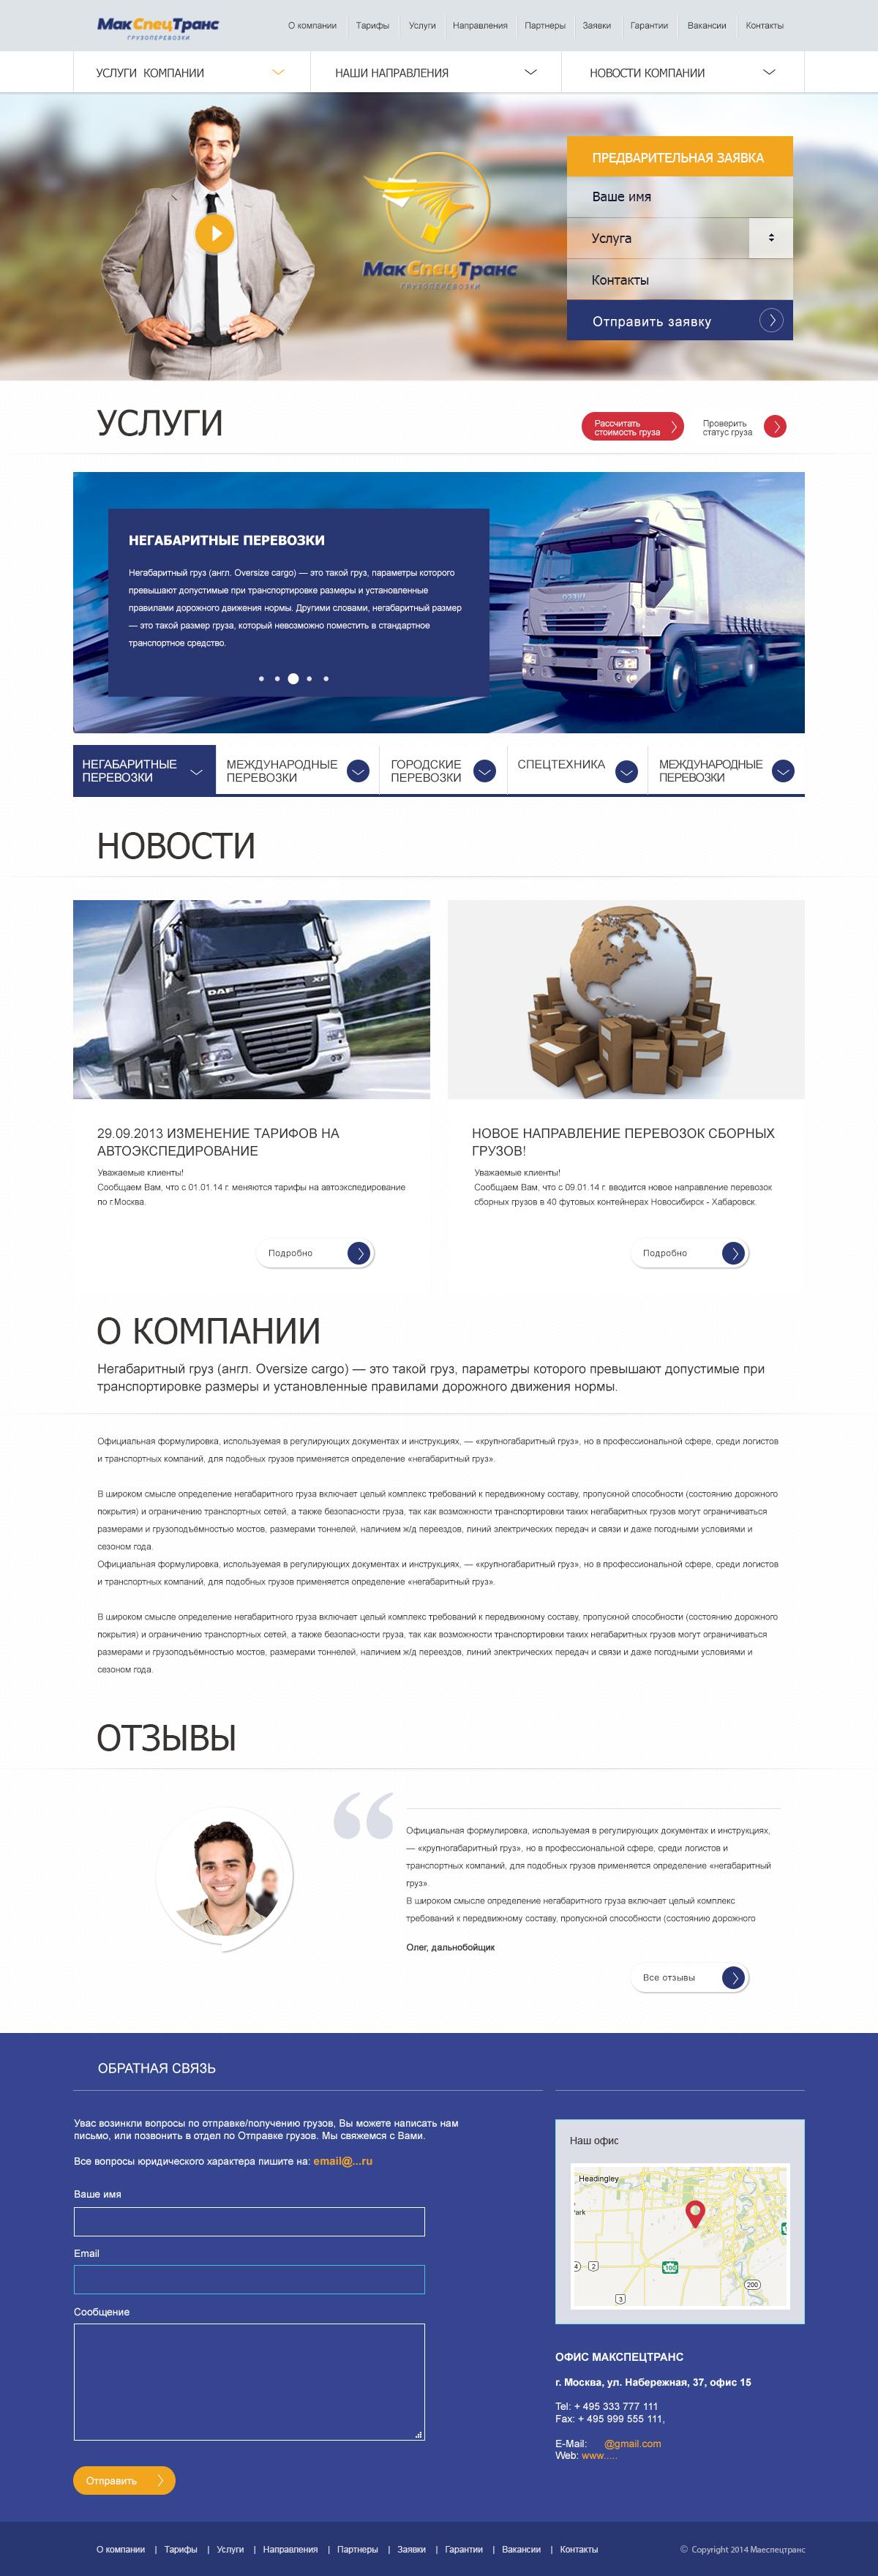 Сайт для грузоперевозочной компании! фото f_97952bede0009bc4.jpg